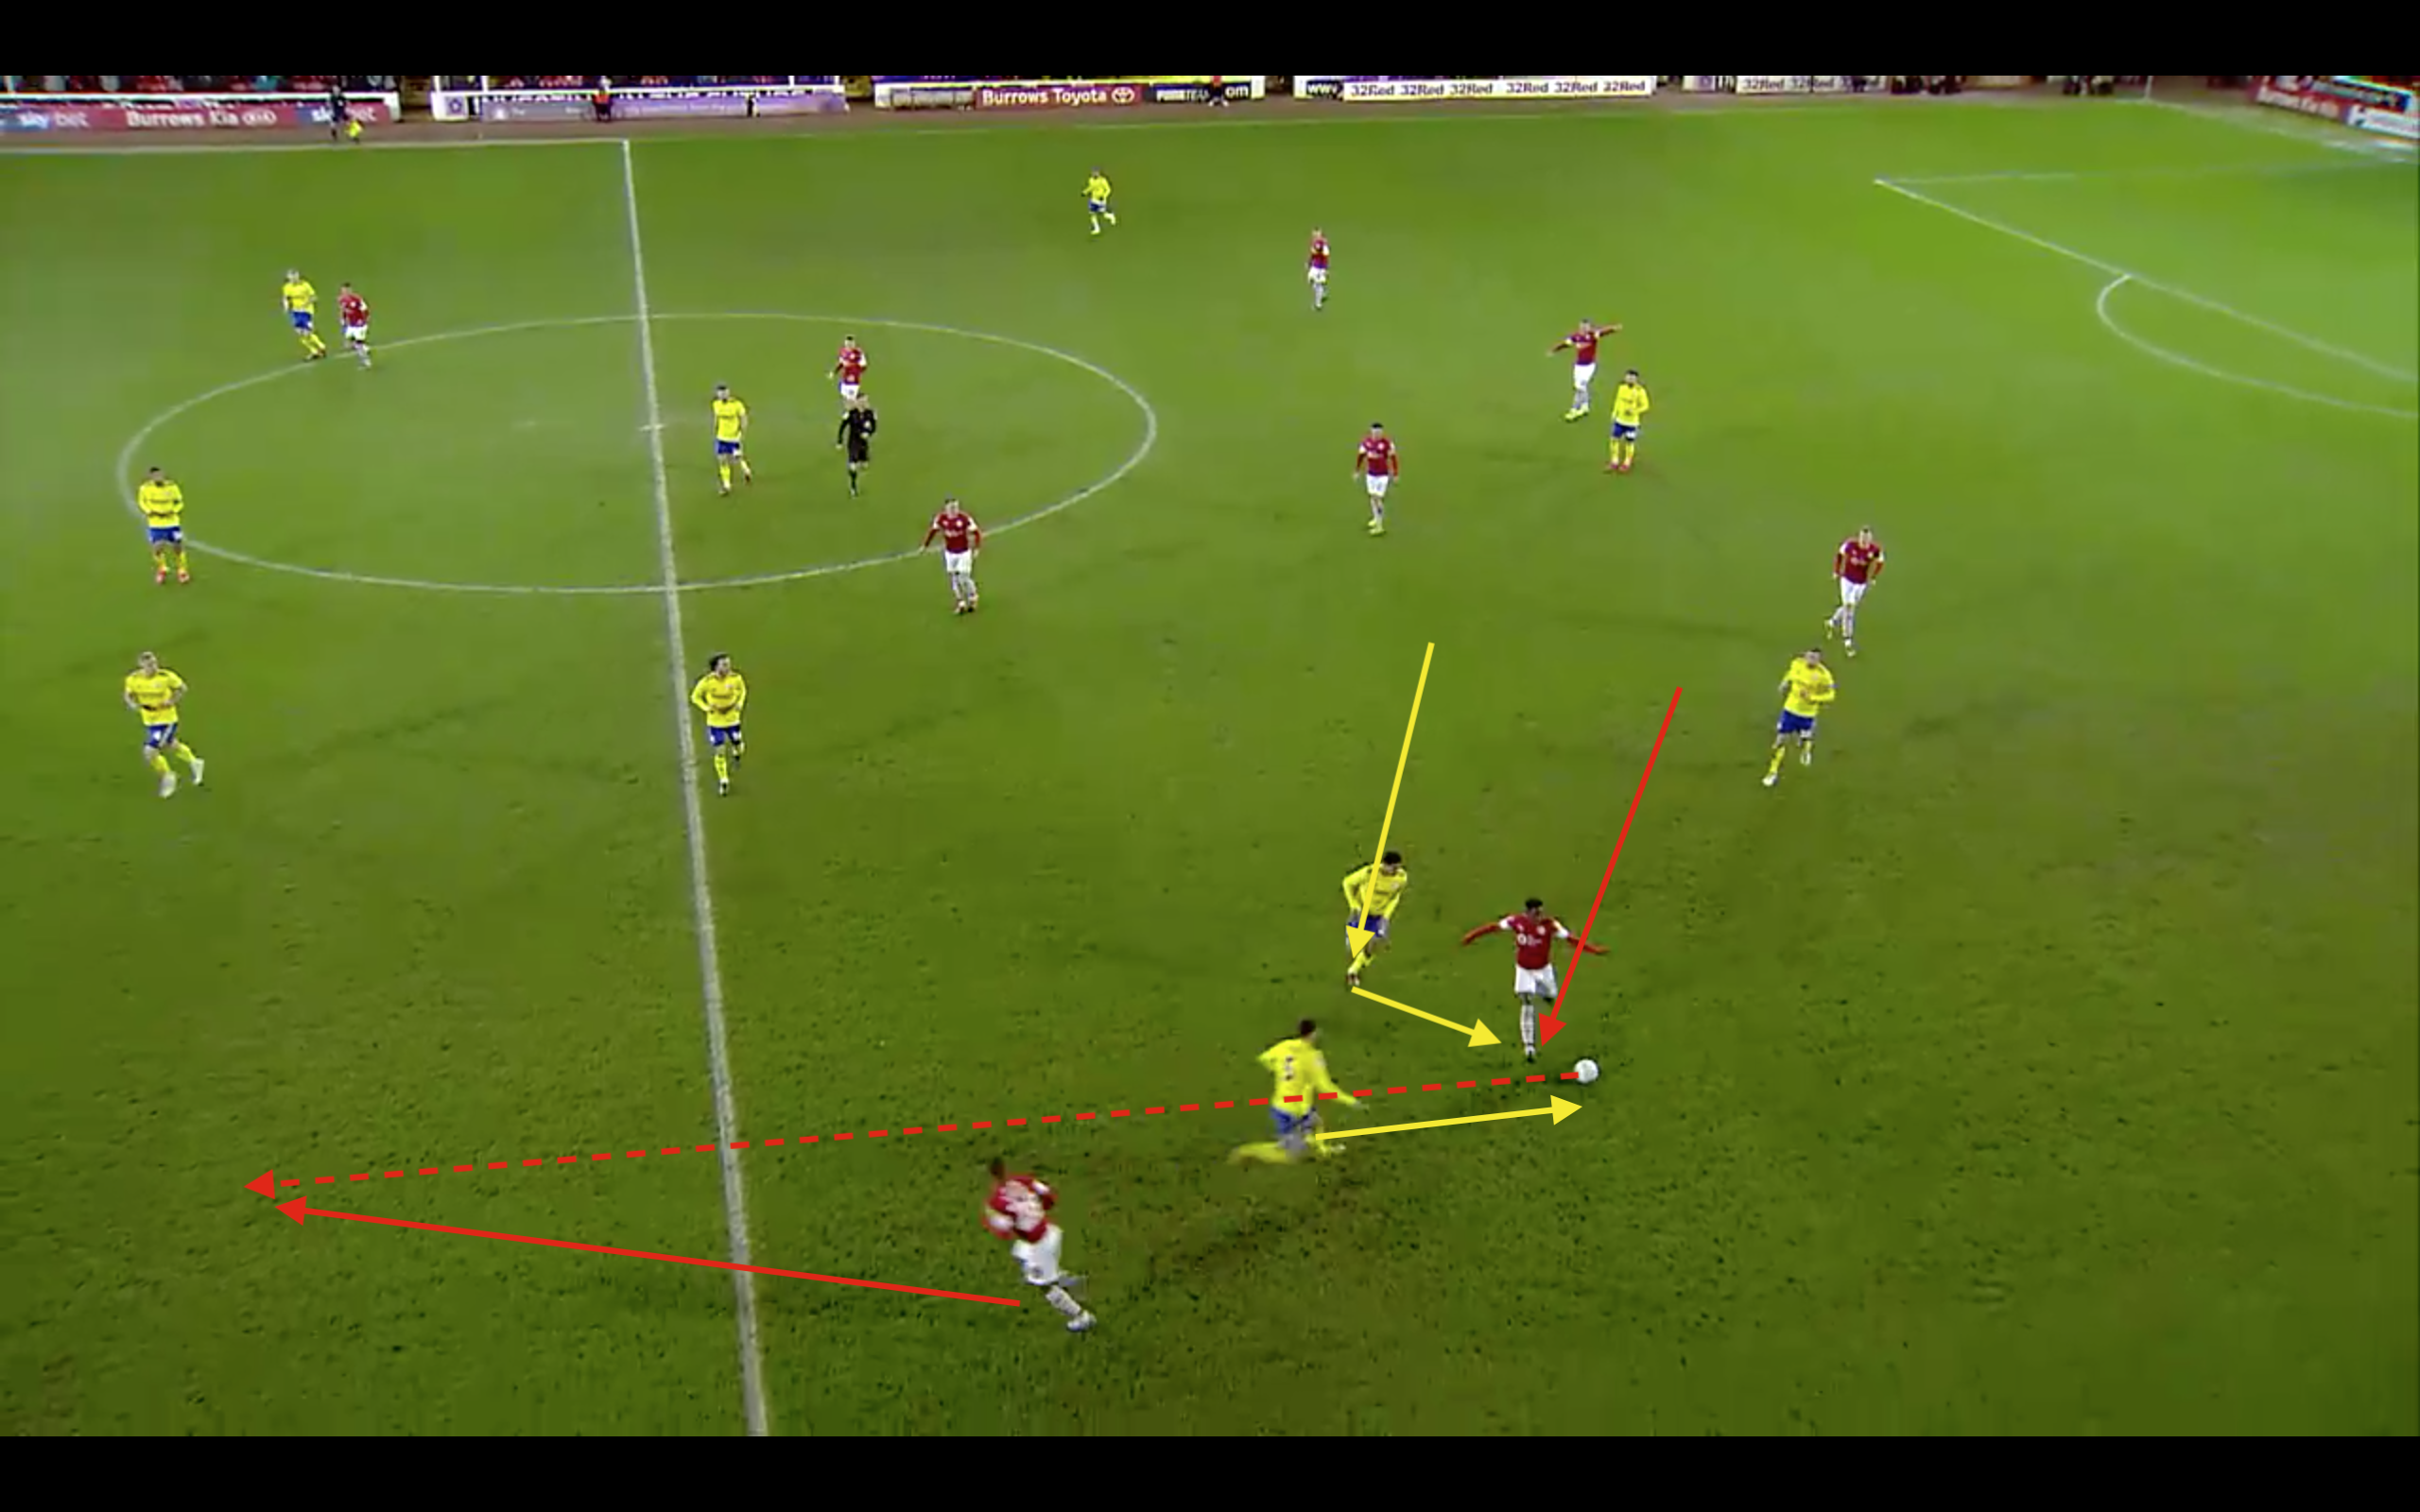 Jude Bellingham at Borussia Dortmund 2019/20 - scout report tactics